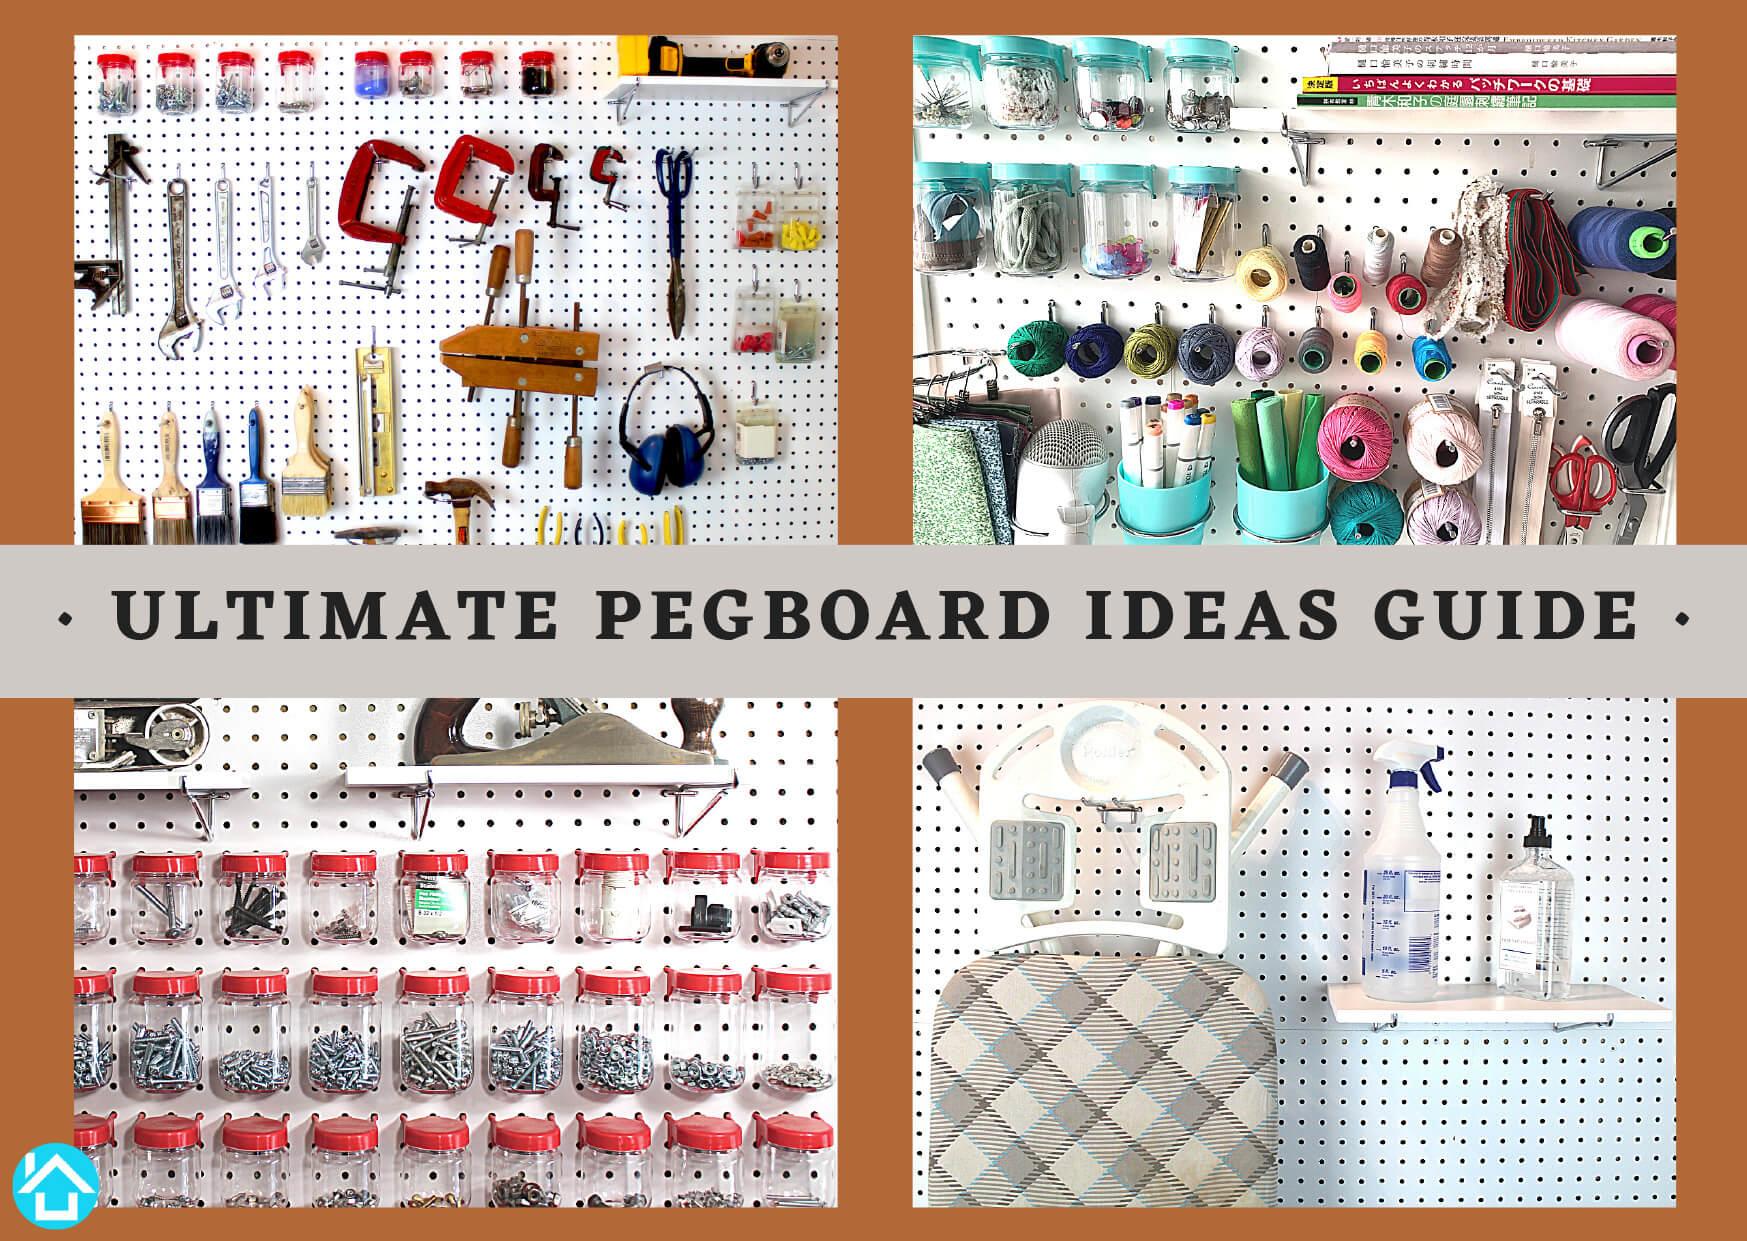 Ultimate Pegboard Ideas Guide